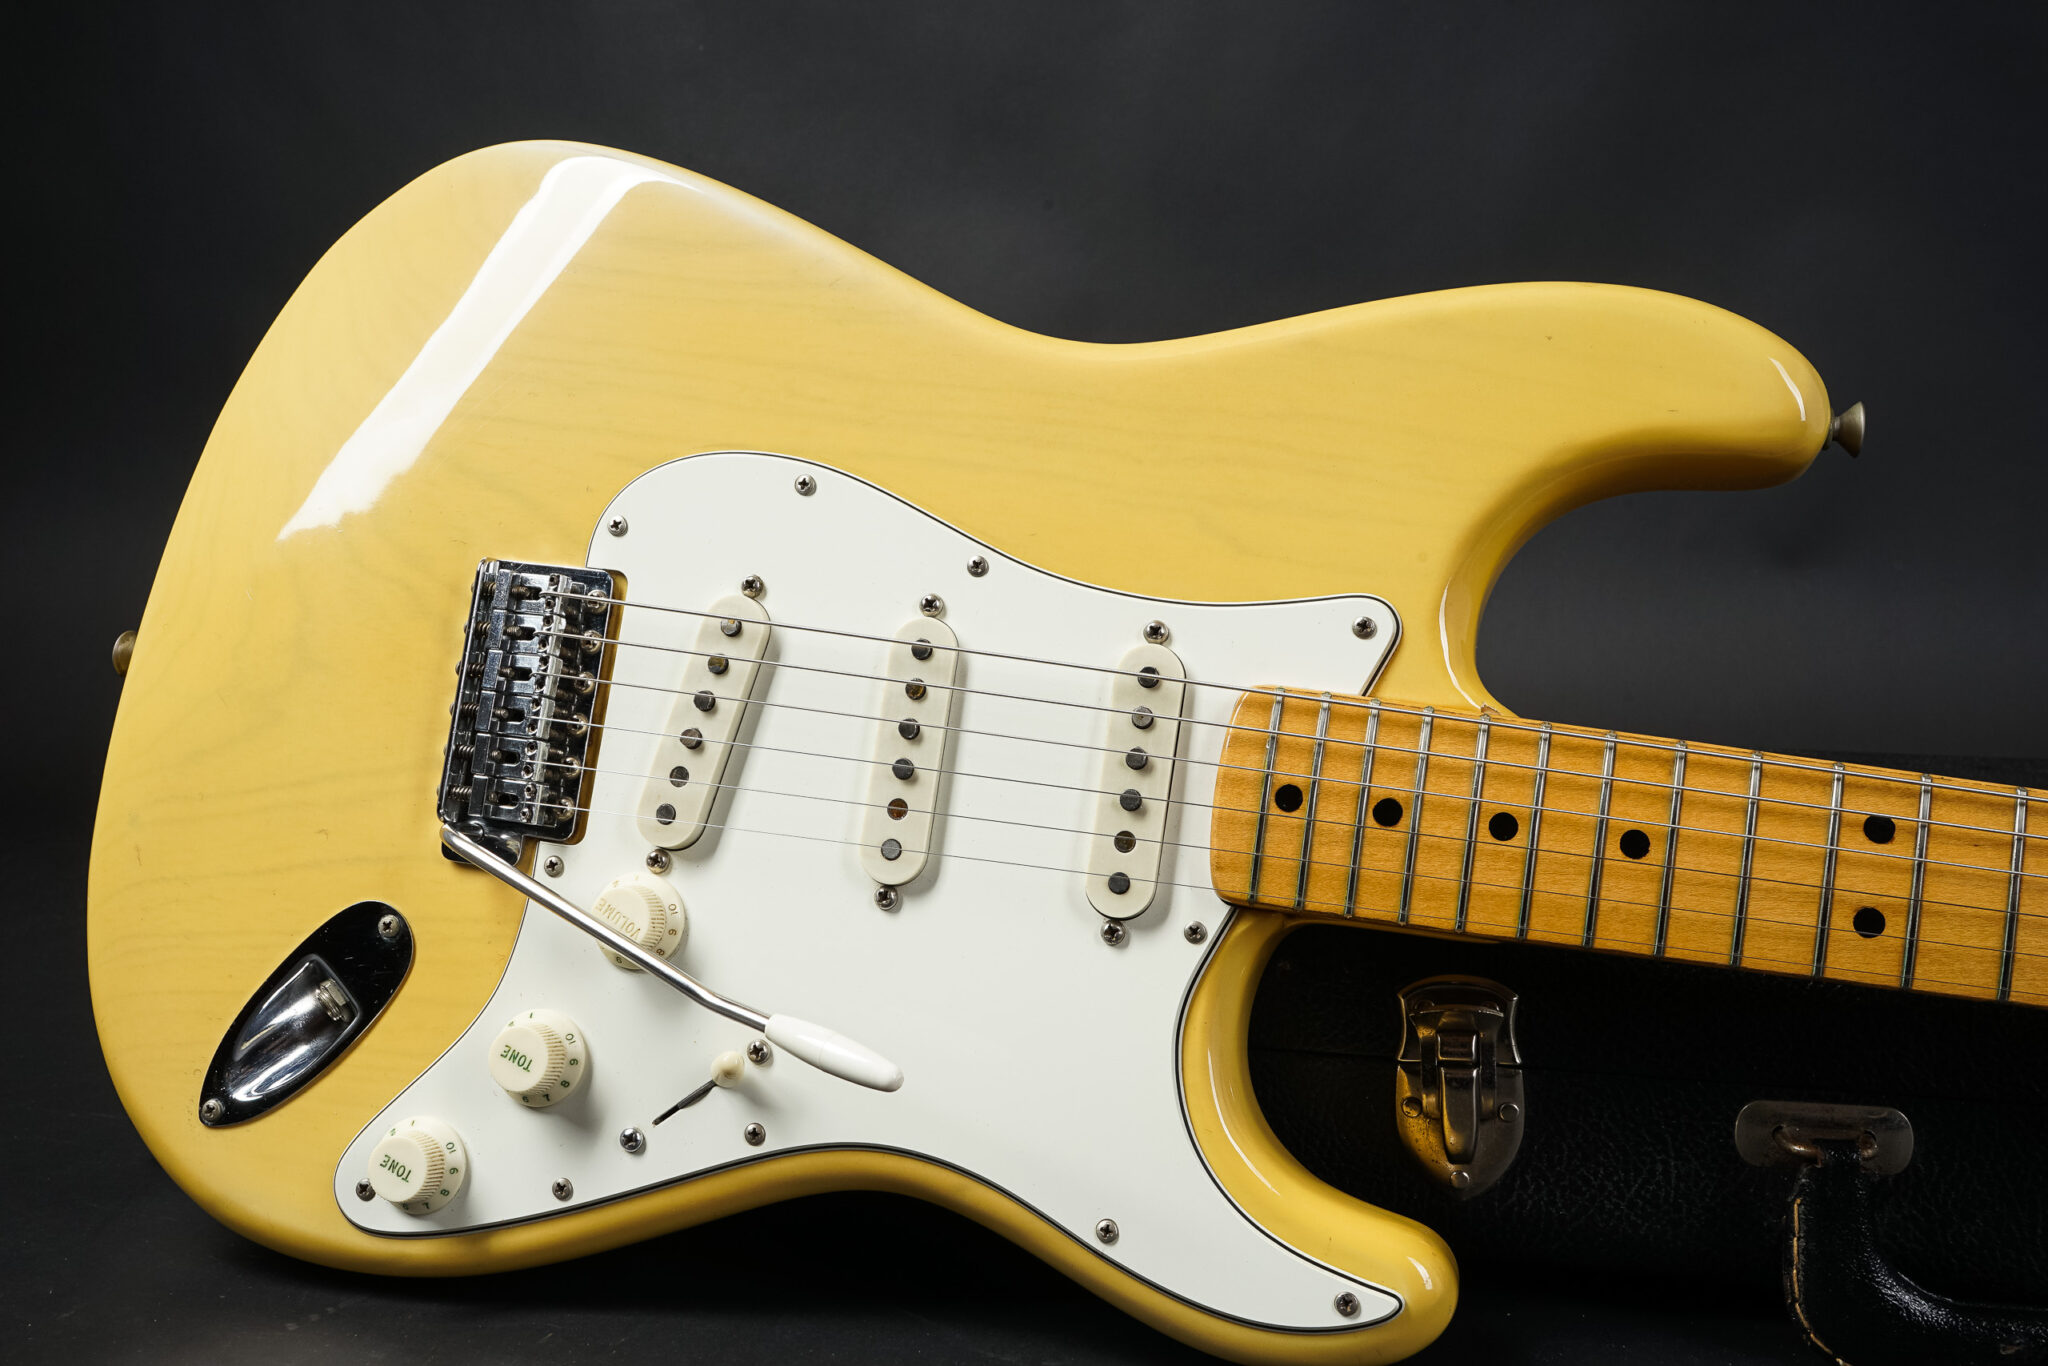 https://guitarpoint.de/app/uploads/products/1974-fender-stratocaster-white-ash-see-thru-finish/1974-Fender-Stratocaster-Blond-577719-11-2048x1366.jpg